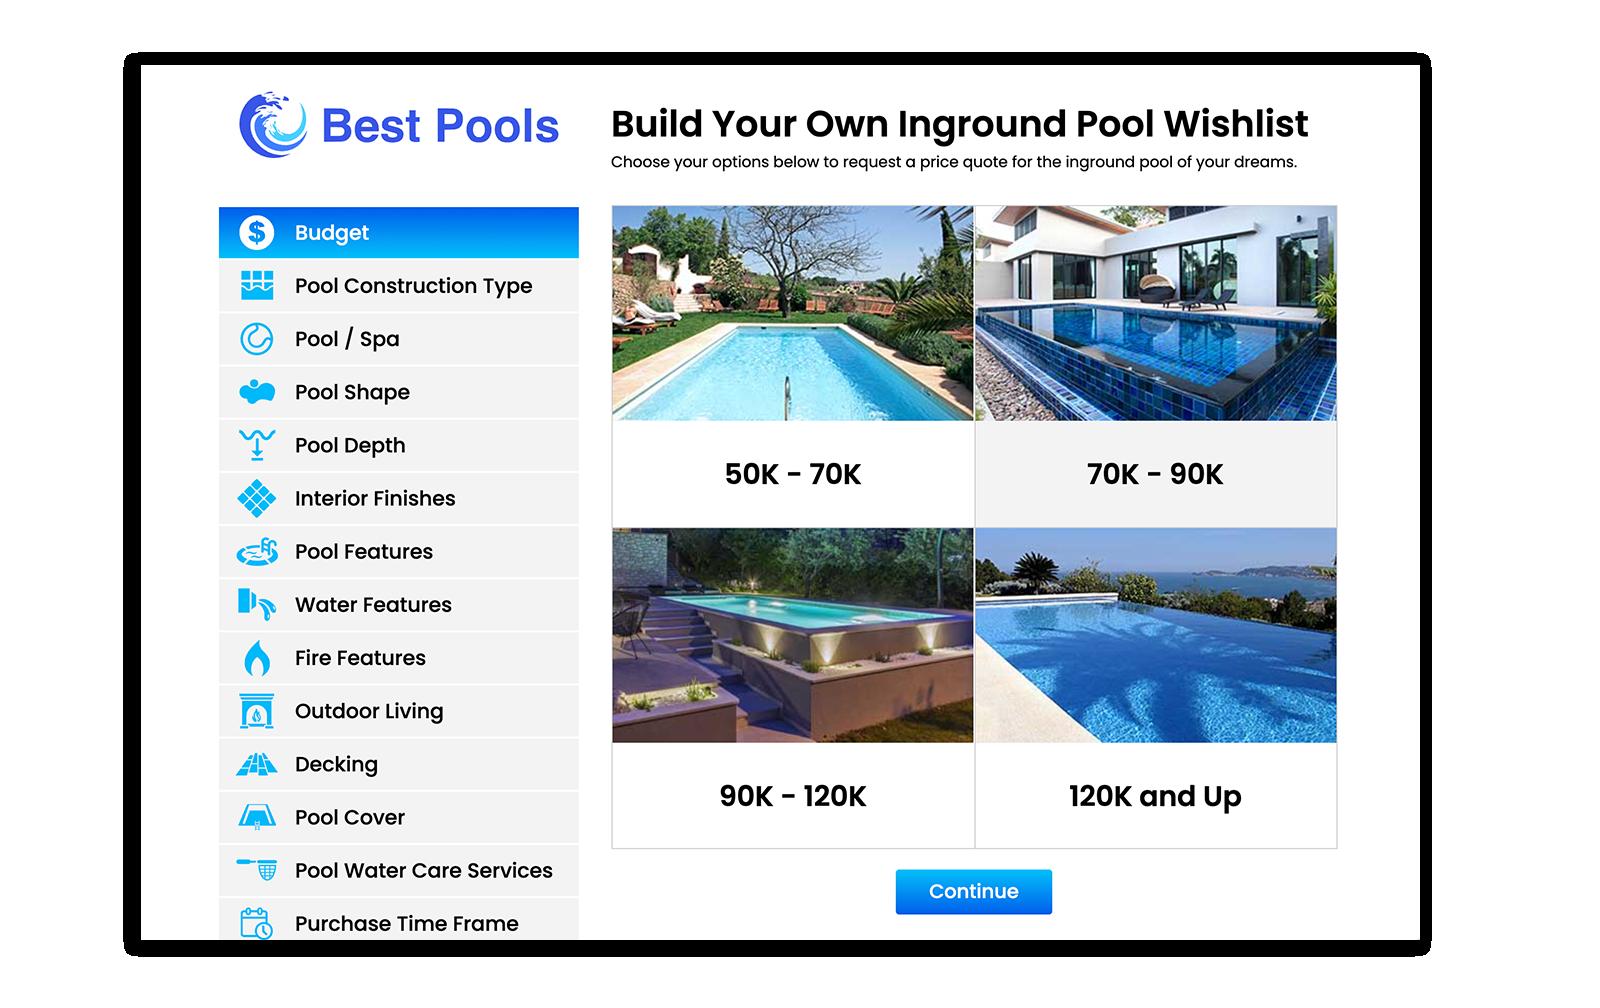 Build Your Own Inground Pool Wishlist